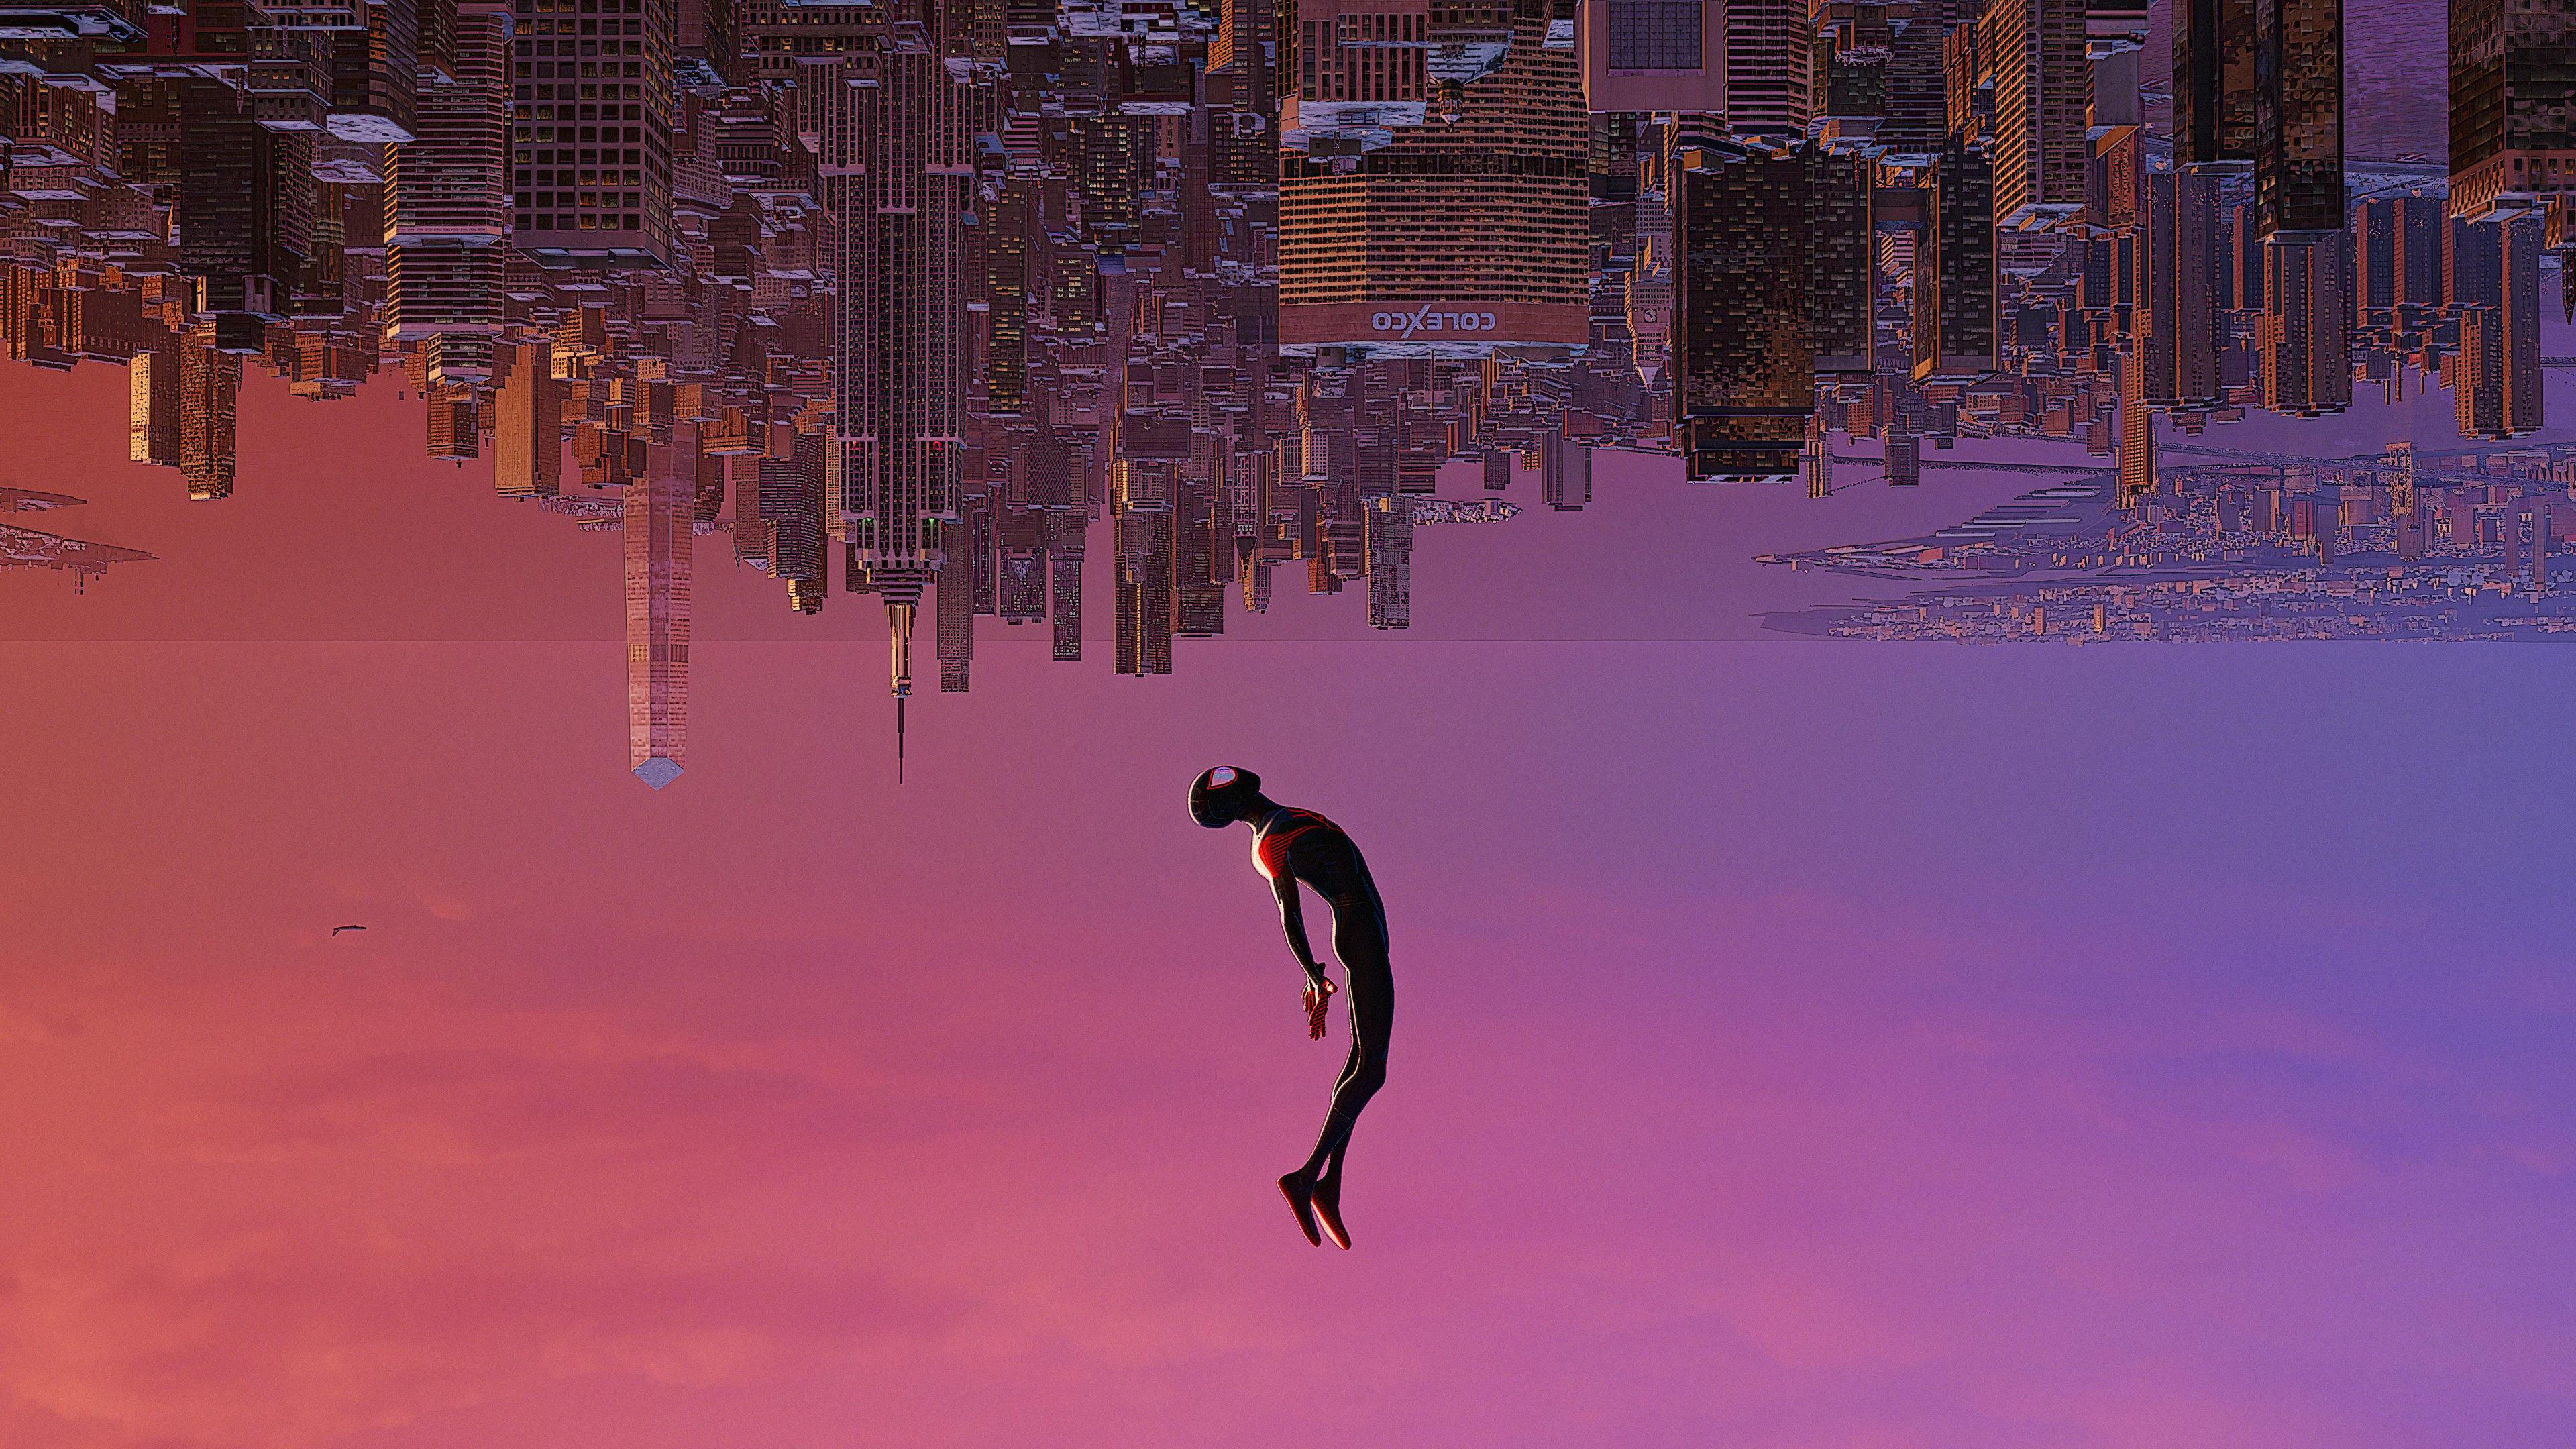 Wallpaper Spiderman upside down